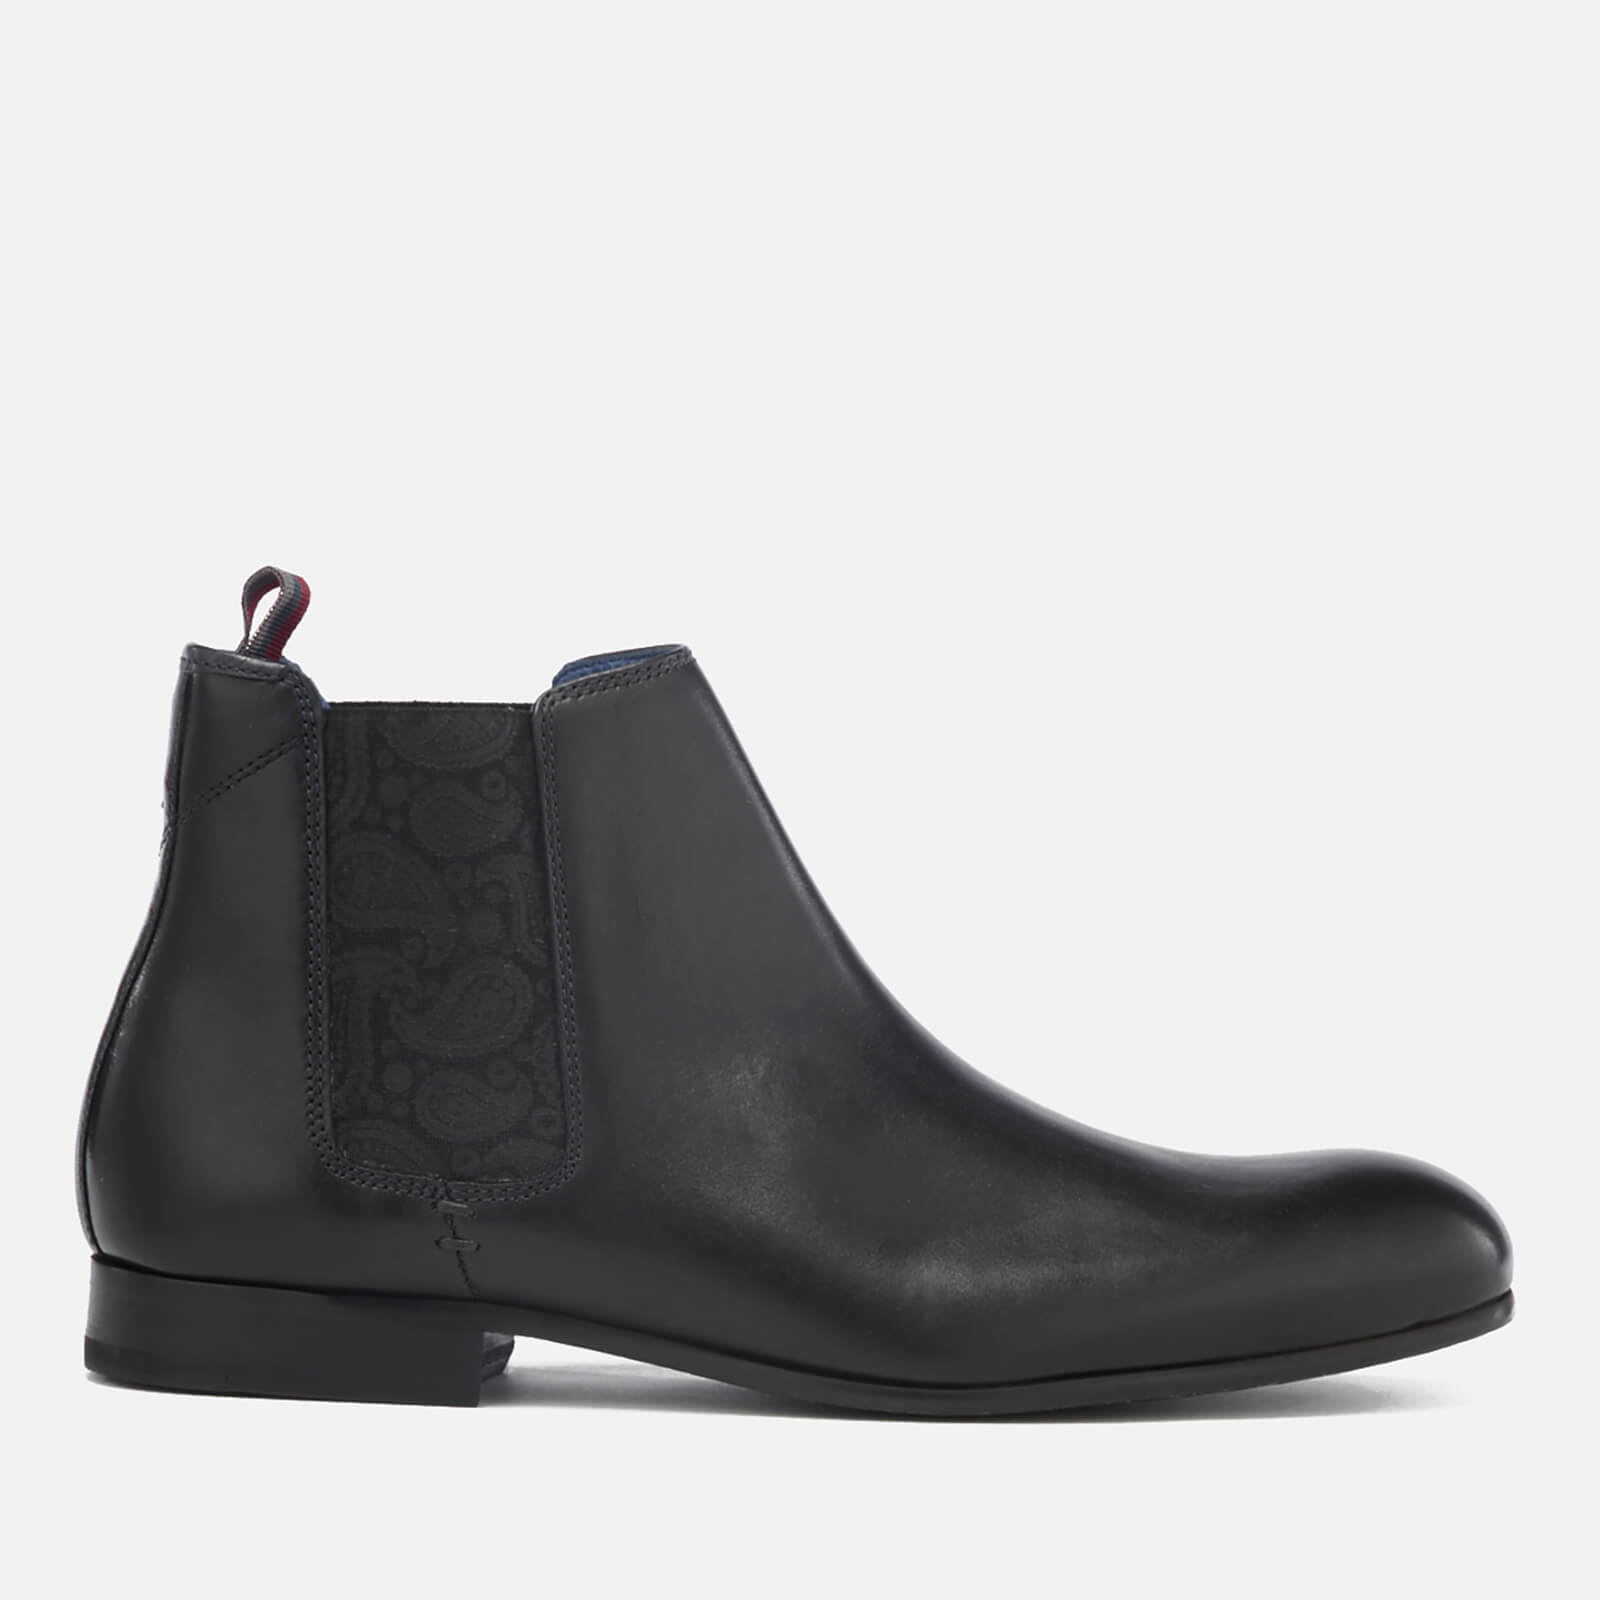 74f0221dc Ted Baker Men s Kayto Leather Chelsea Boots - Black Mens Footwear ...